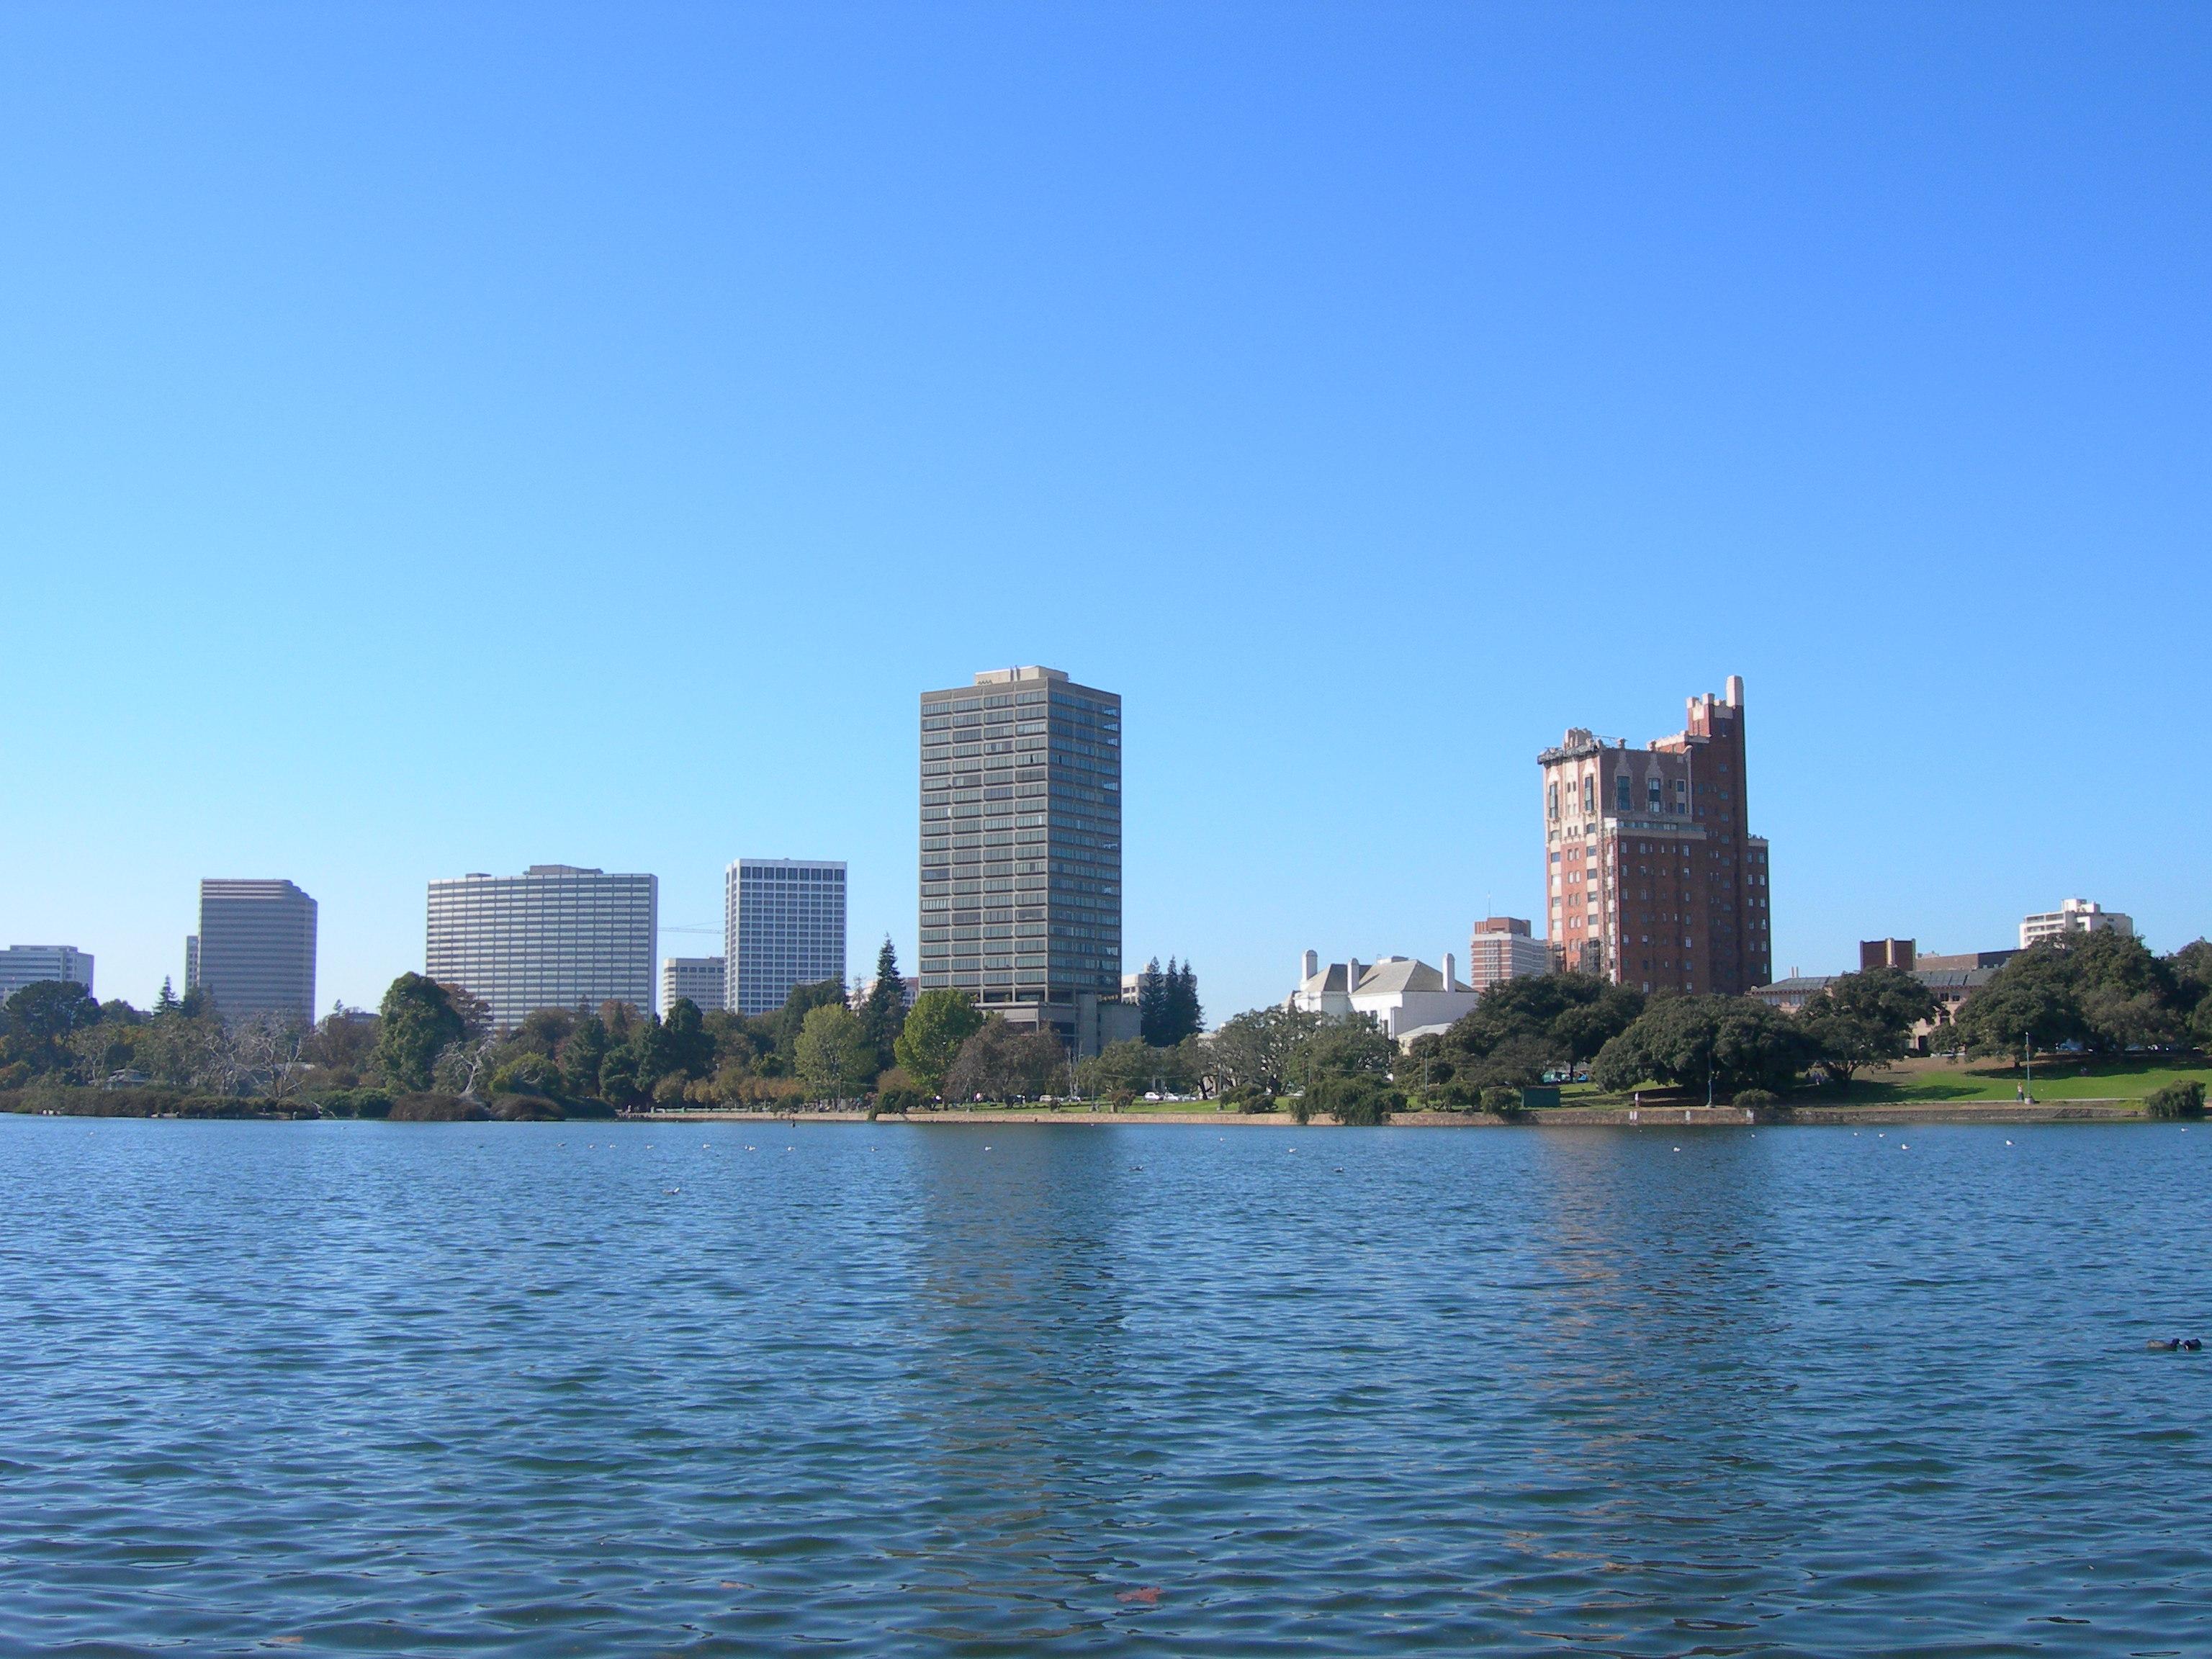 Oakland skyline photo